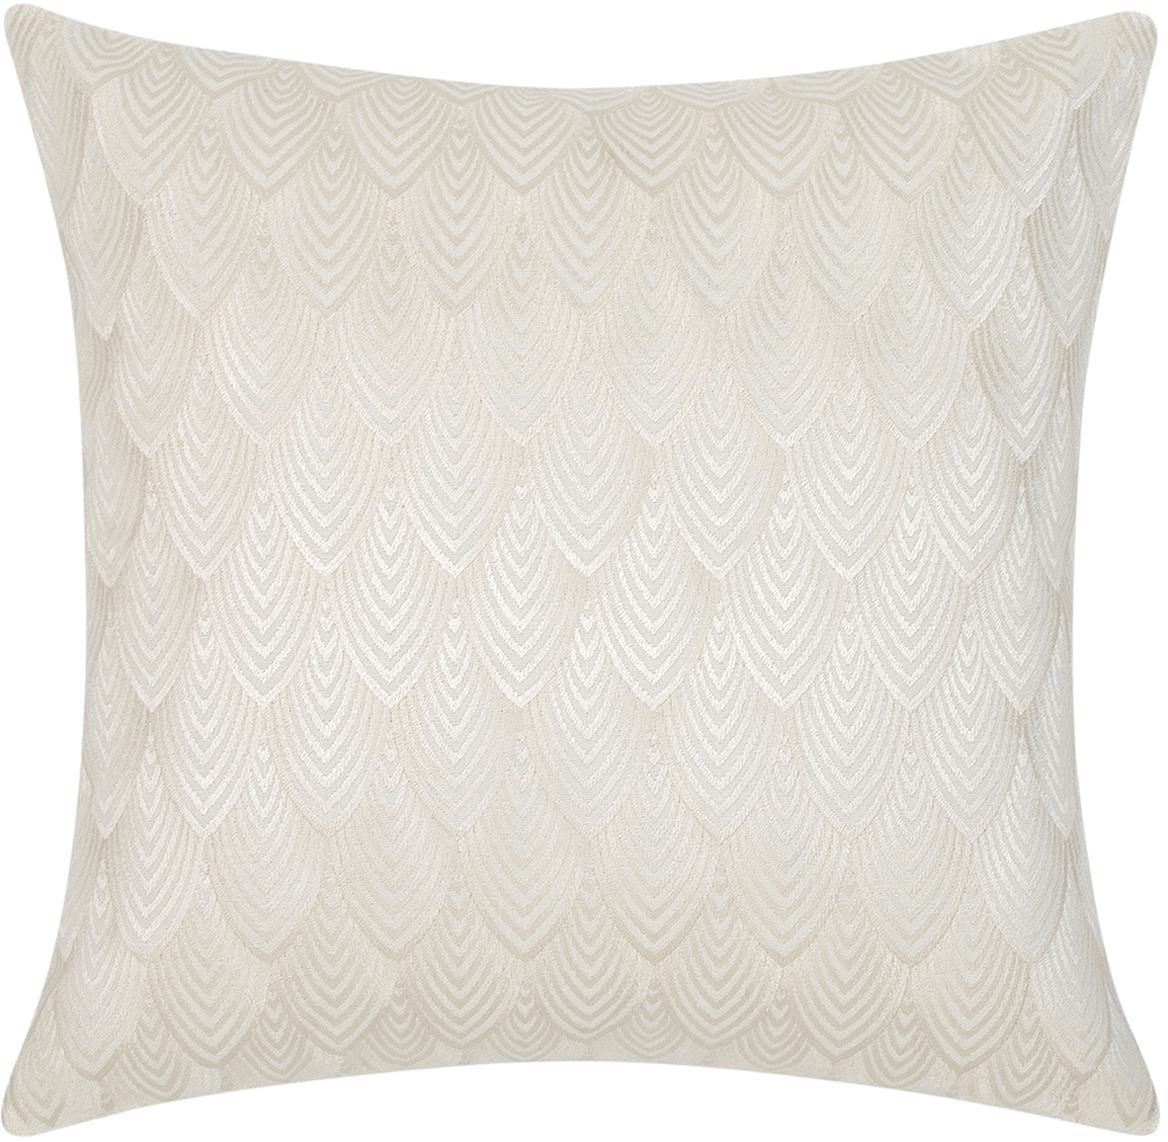 Federa arredo  ricamata Giselle, Cotone, Bianco crema, Larg. 45 x Lung. 45 cm